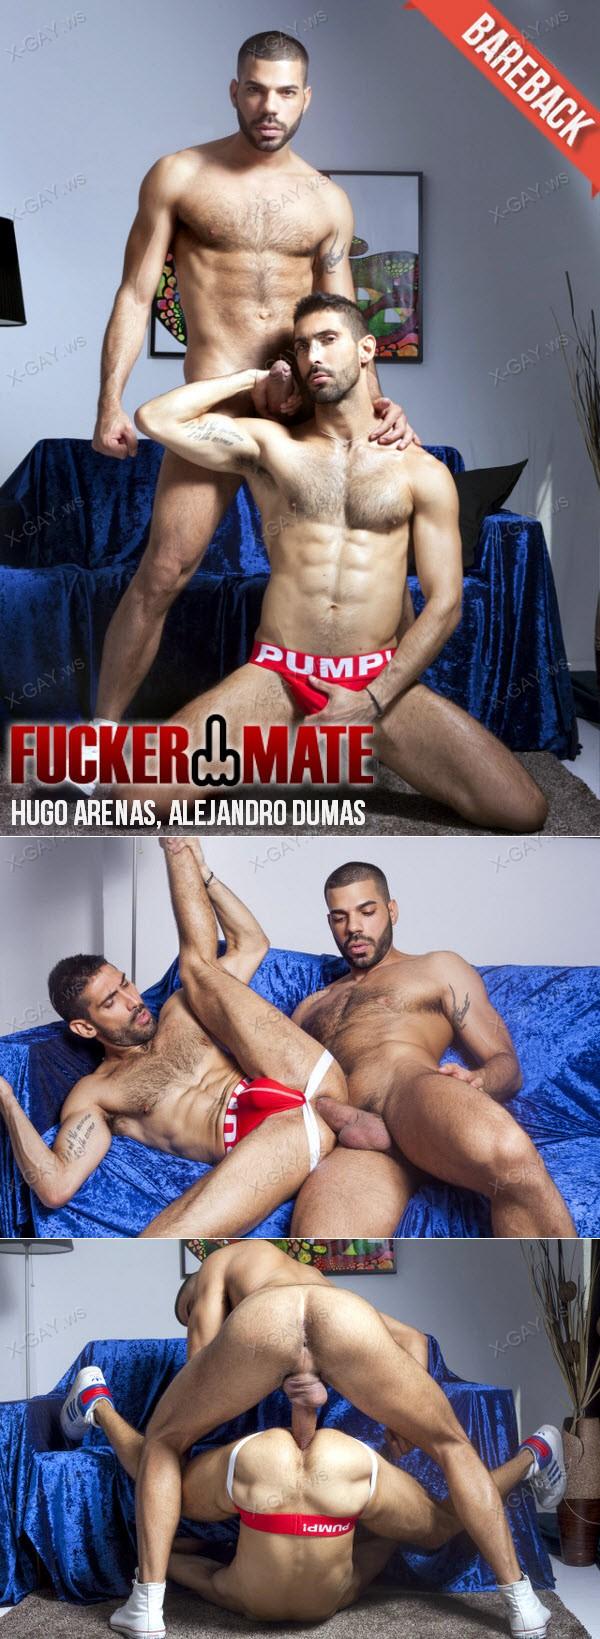 FuckerMate: Cuban Freedom (Hugo Arenas, Alejandro Dumas) (Bareback)